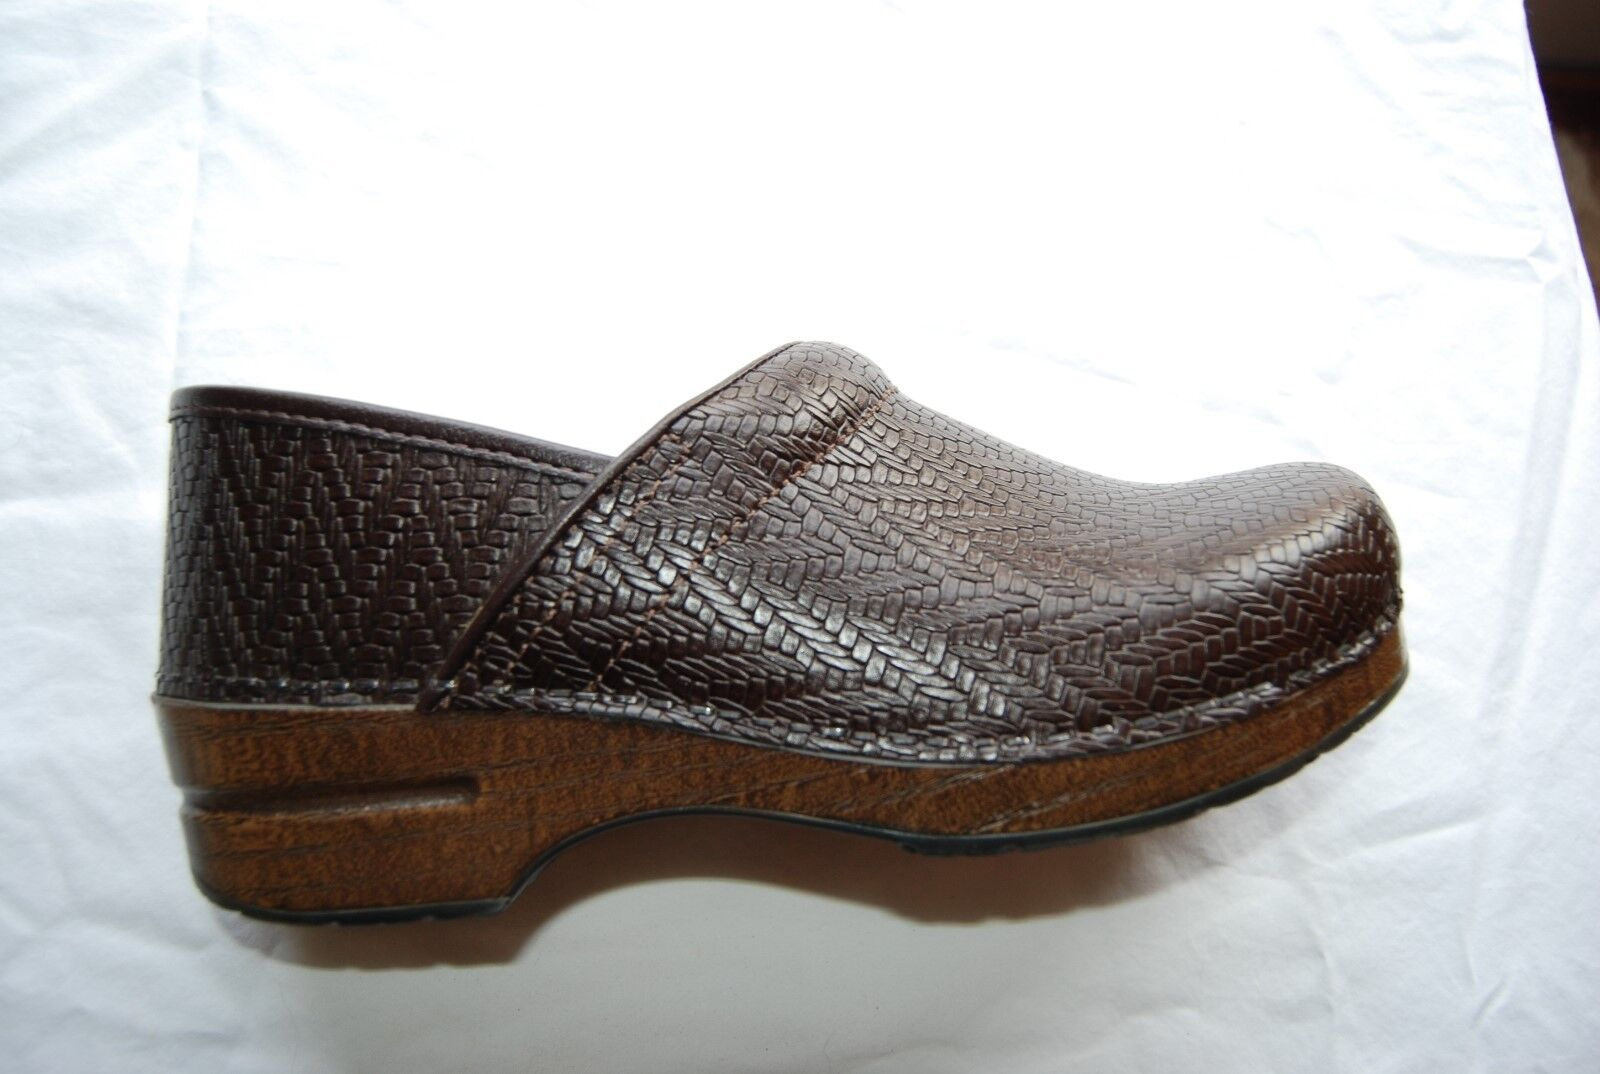 Dark Brown Woven Look Leather DANSKO Stapled Clogs EU 40 US 9.5 - 10